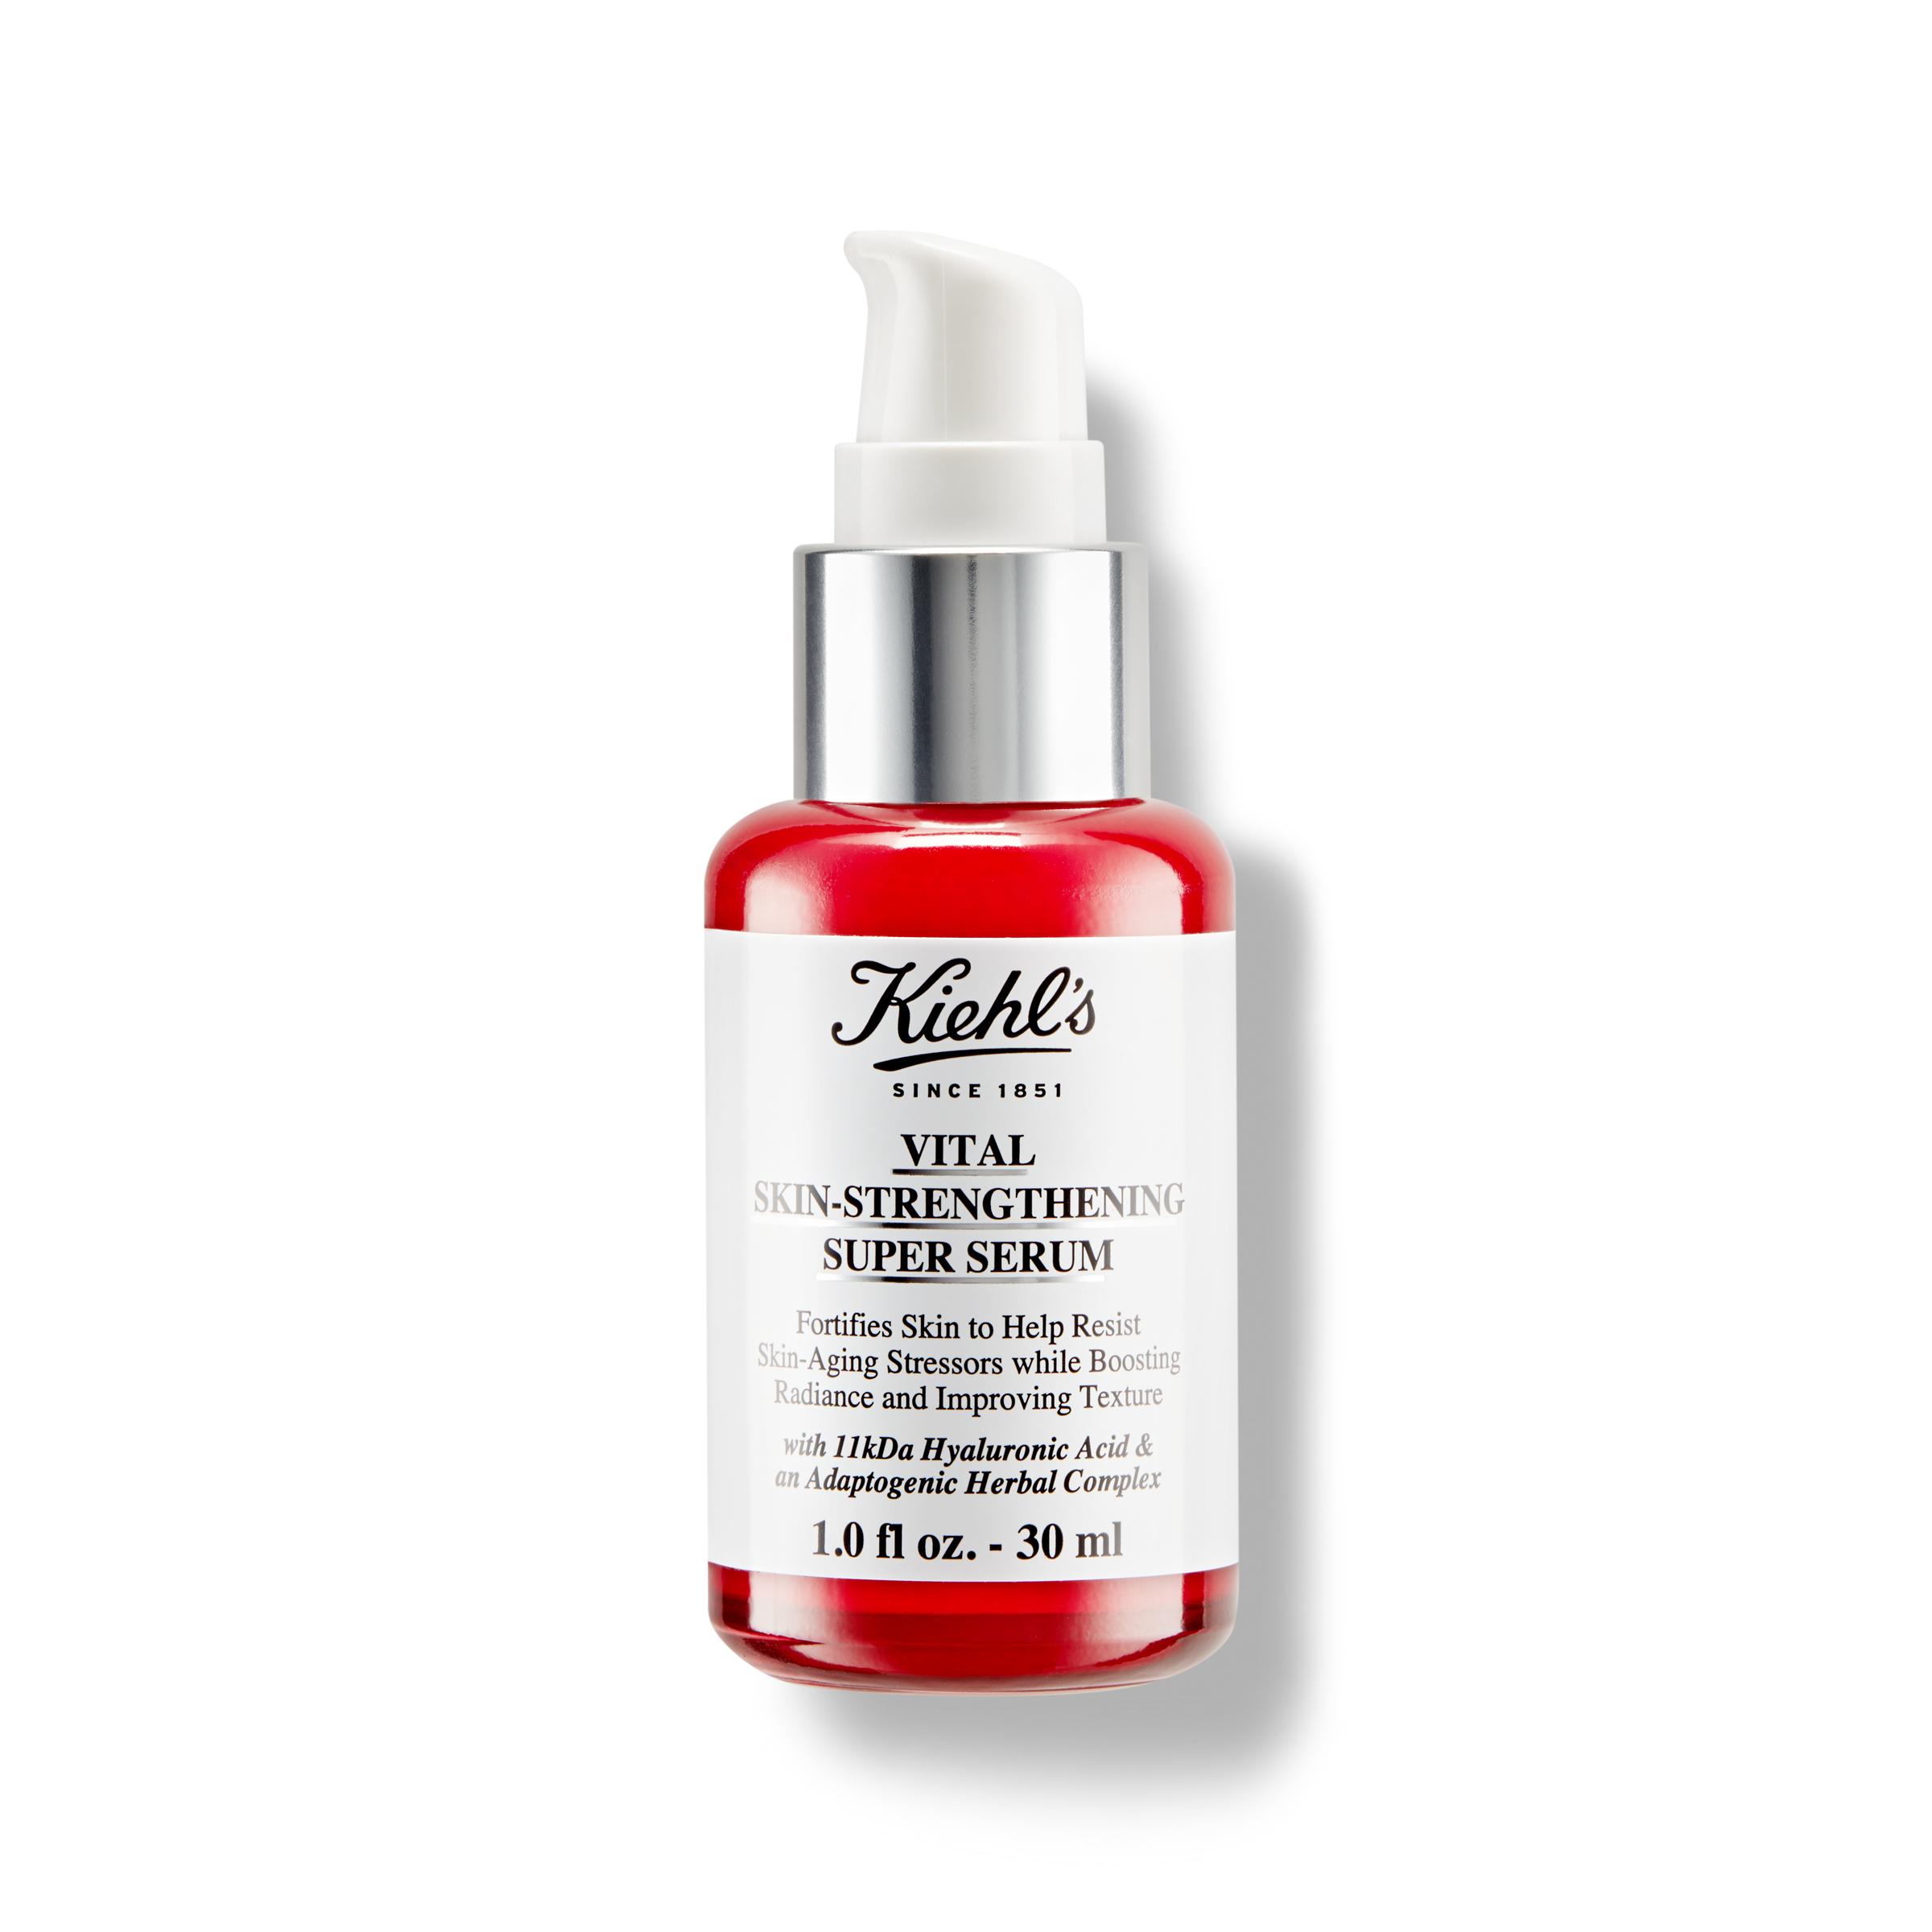 kiehls-face-serum-vital-skin-strengthening-super-serum-30ml